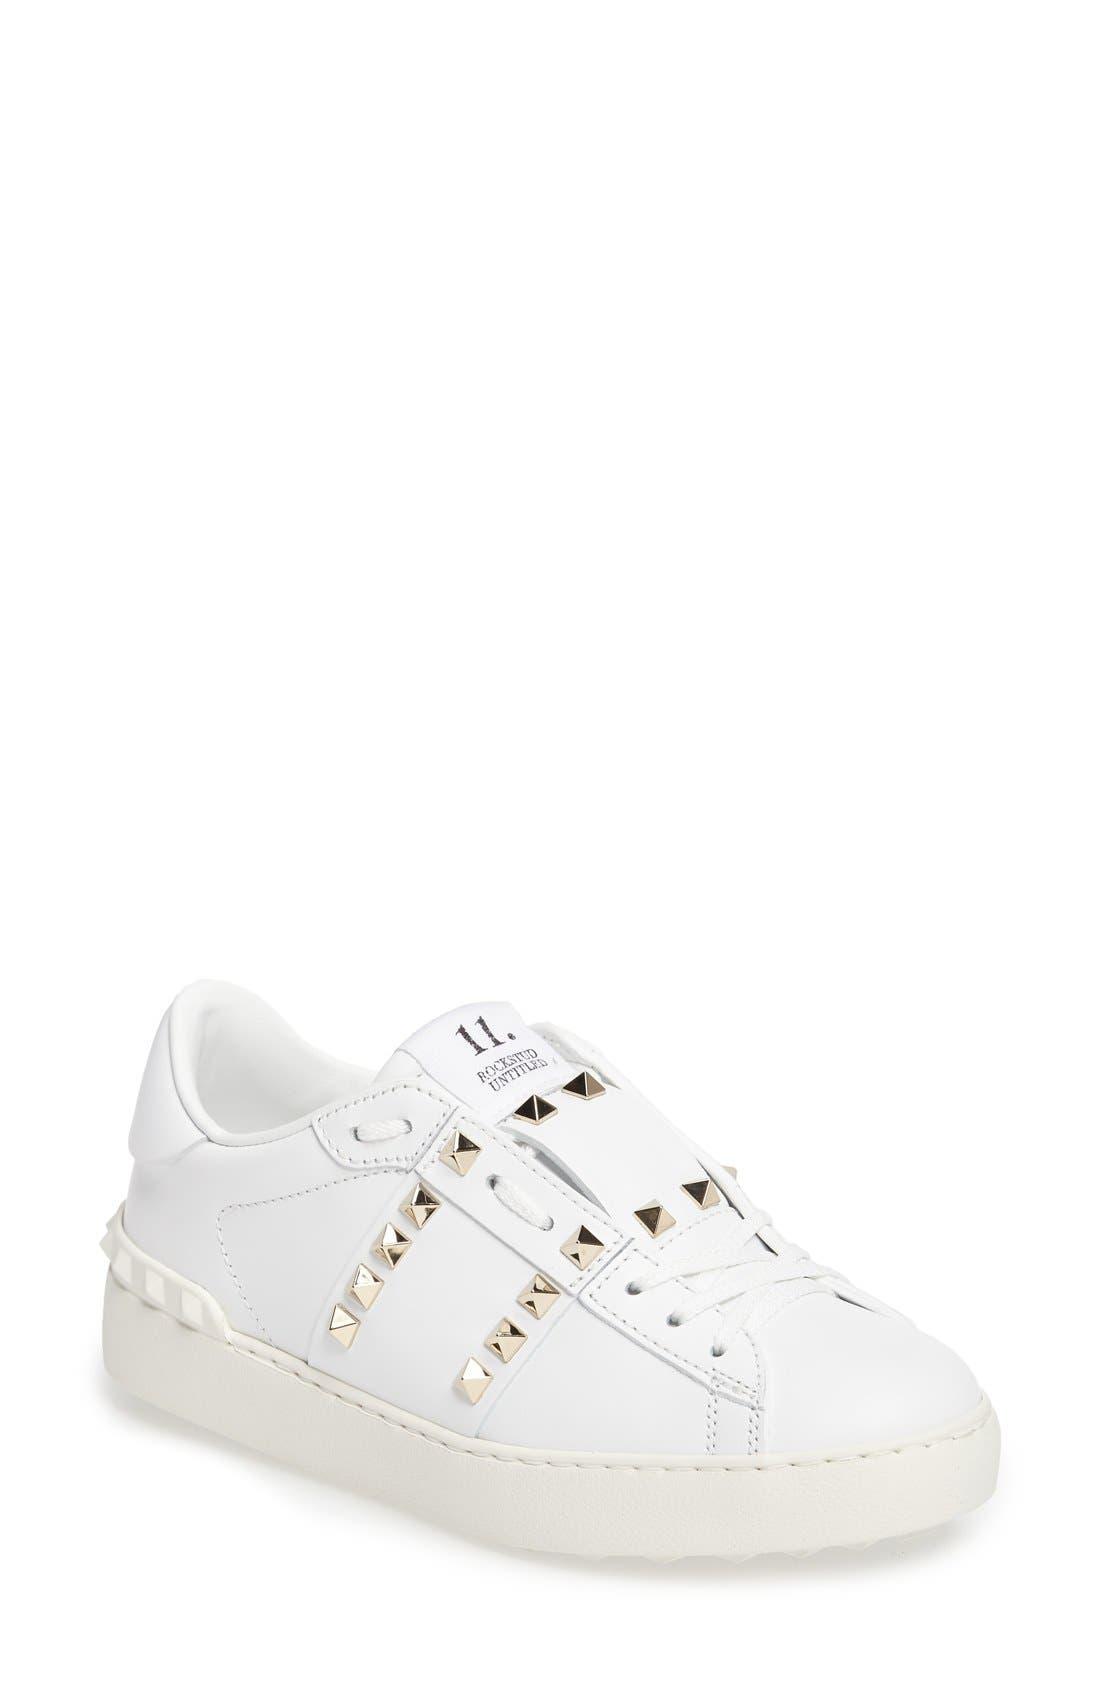 Women's Valentino Garavani Shoes